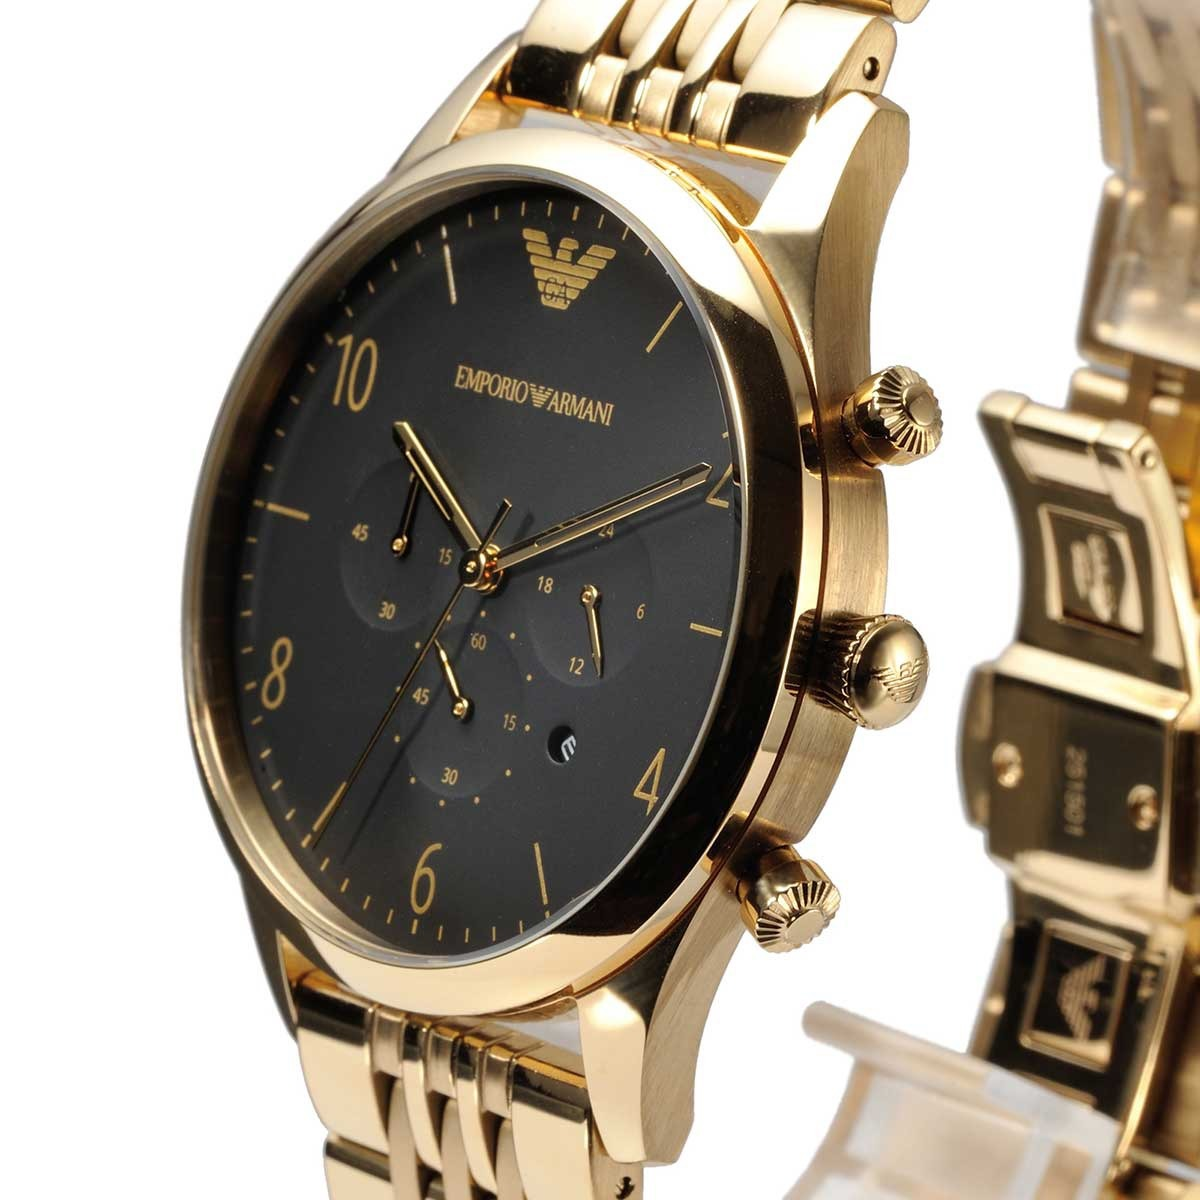 f9f7ecb5d2d4 Reloj Emporio Armani Hombre Ar1893 Cronógrafo Envío Gratis ...